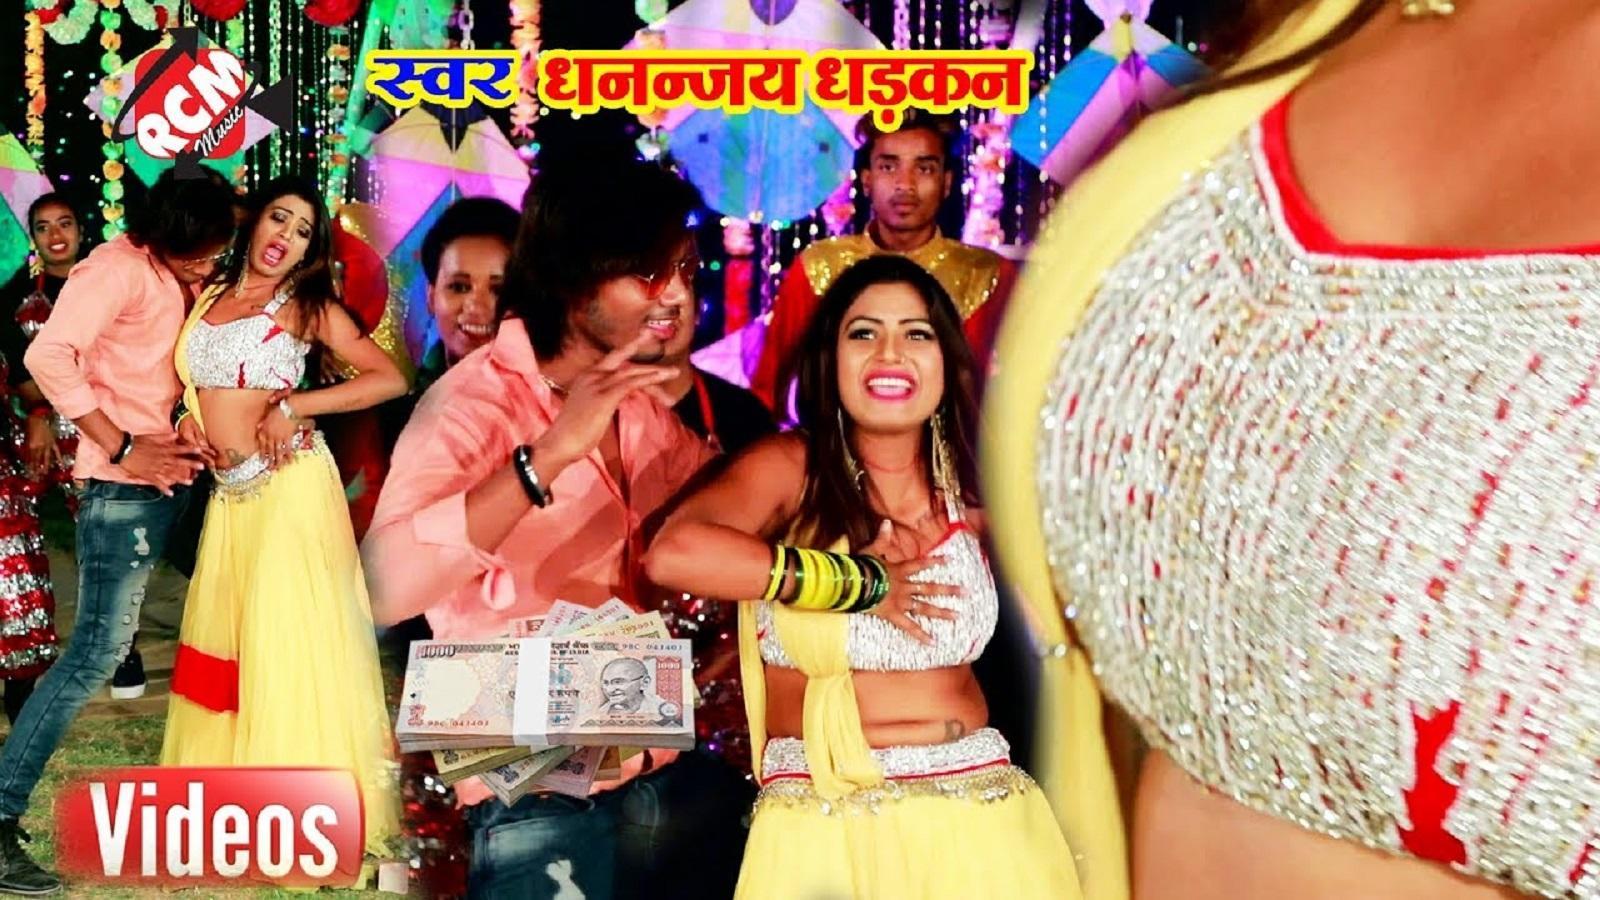 Bhojpuri Gana / Geet: Latest Bhojpuri Song 'Khula Paisa Jhula Me ...